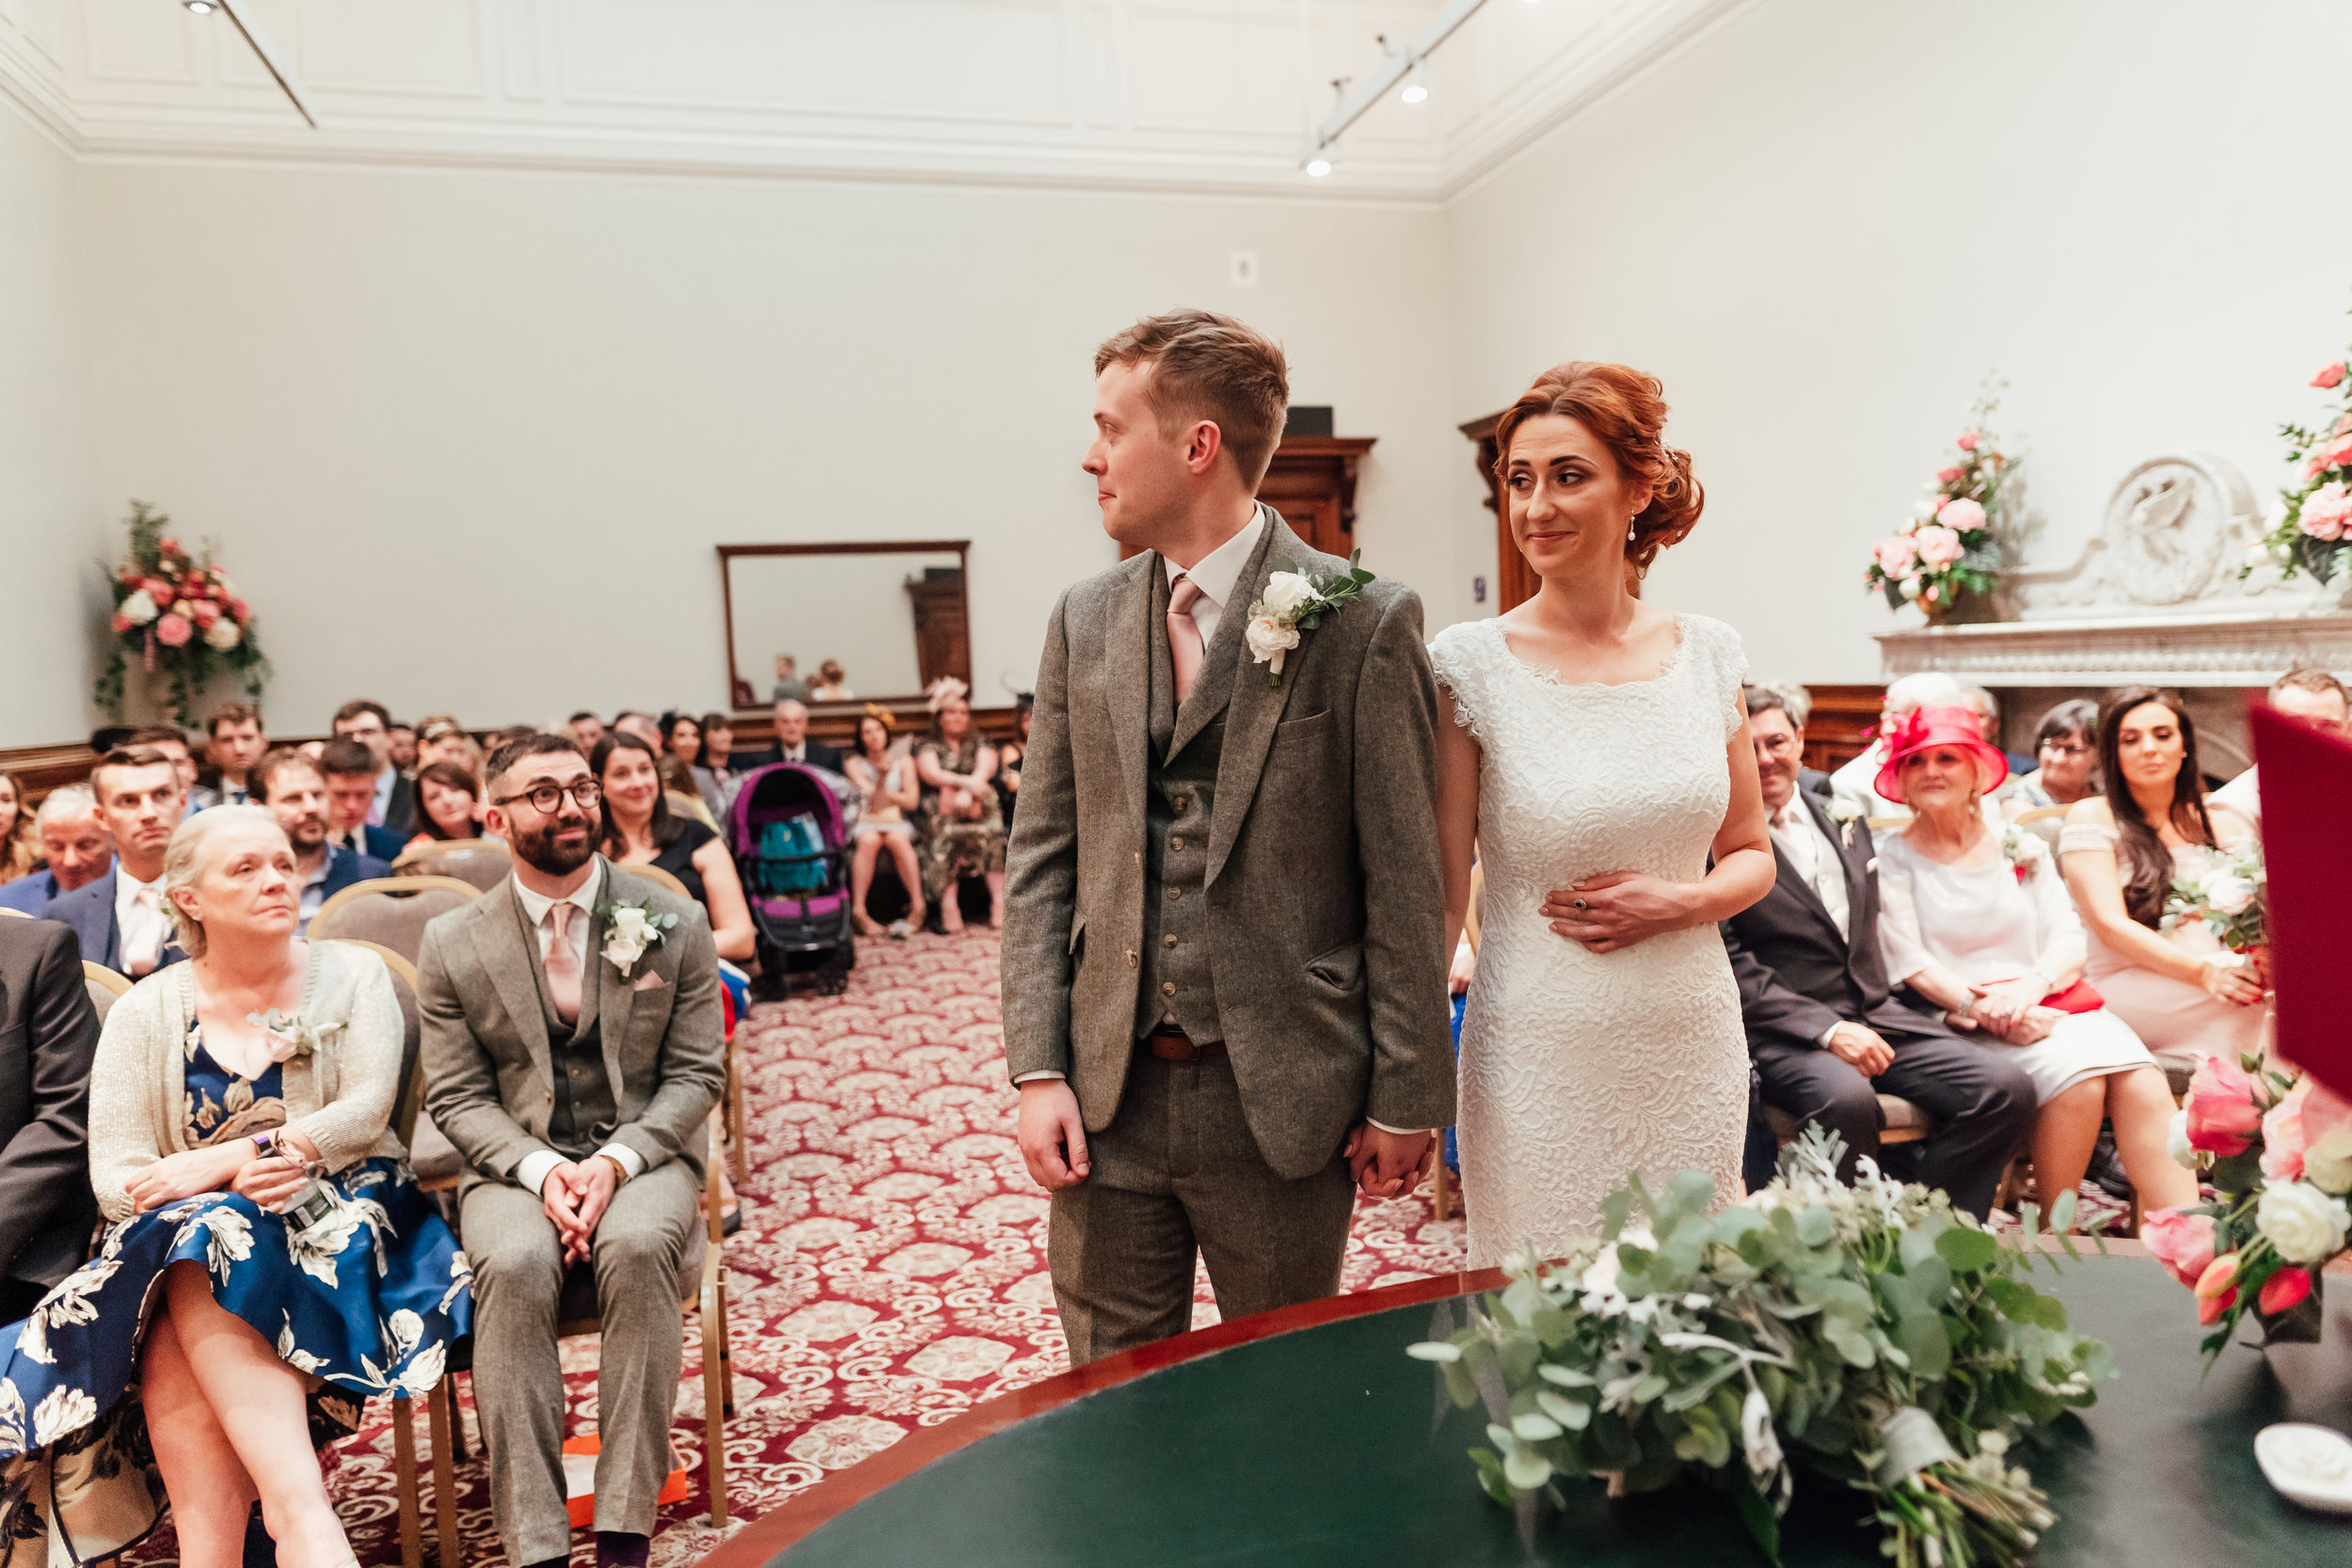 st-georges-hall-liverpool-wedding-83.jpg